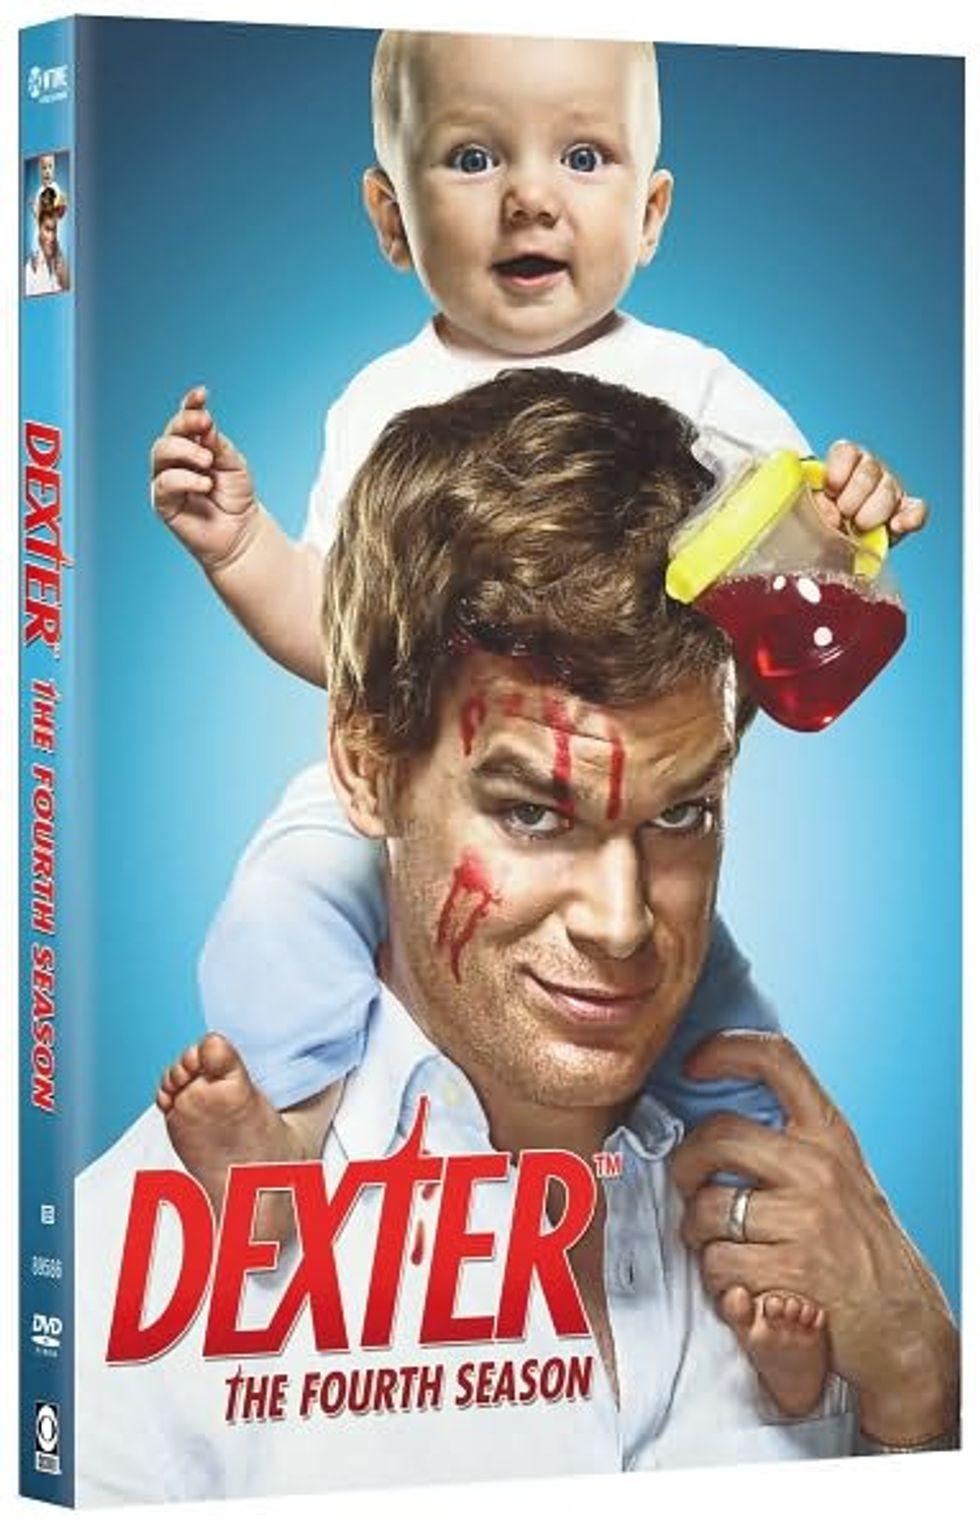 Dexter The Fourth Season On Blu-ray & DVD!